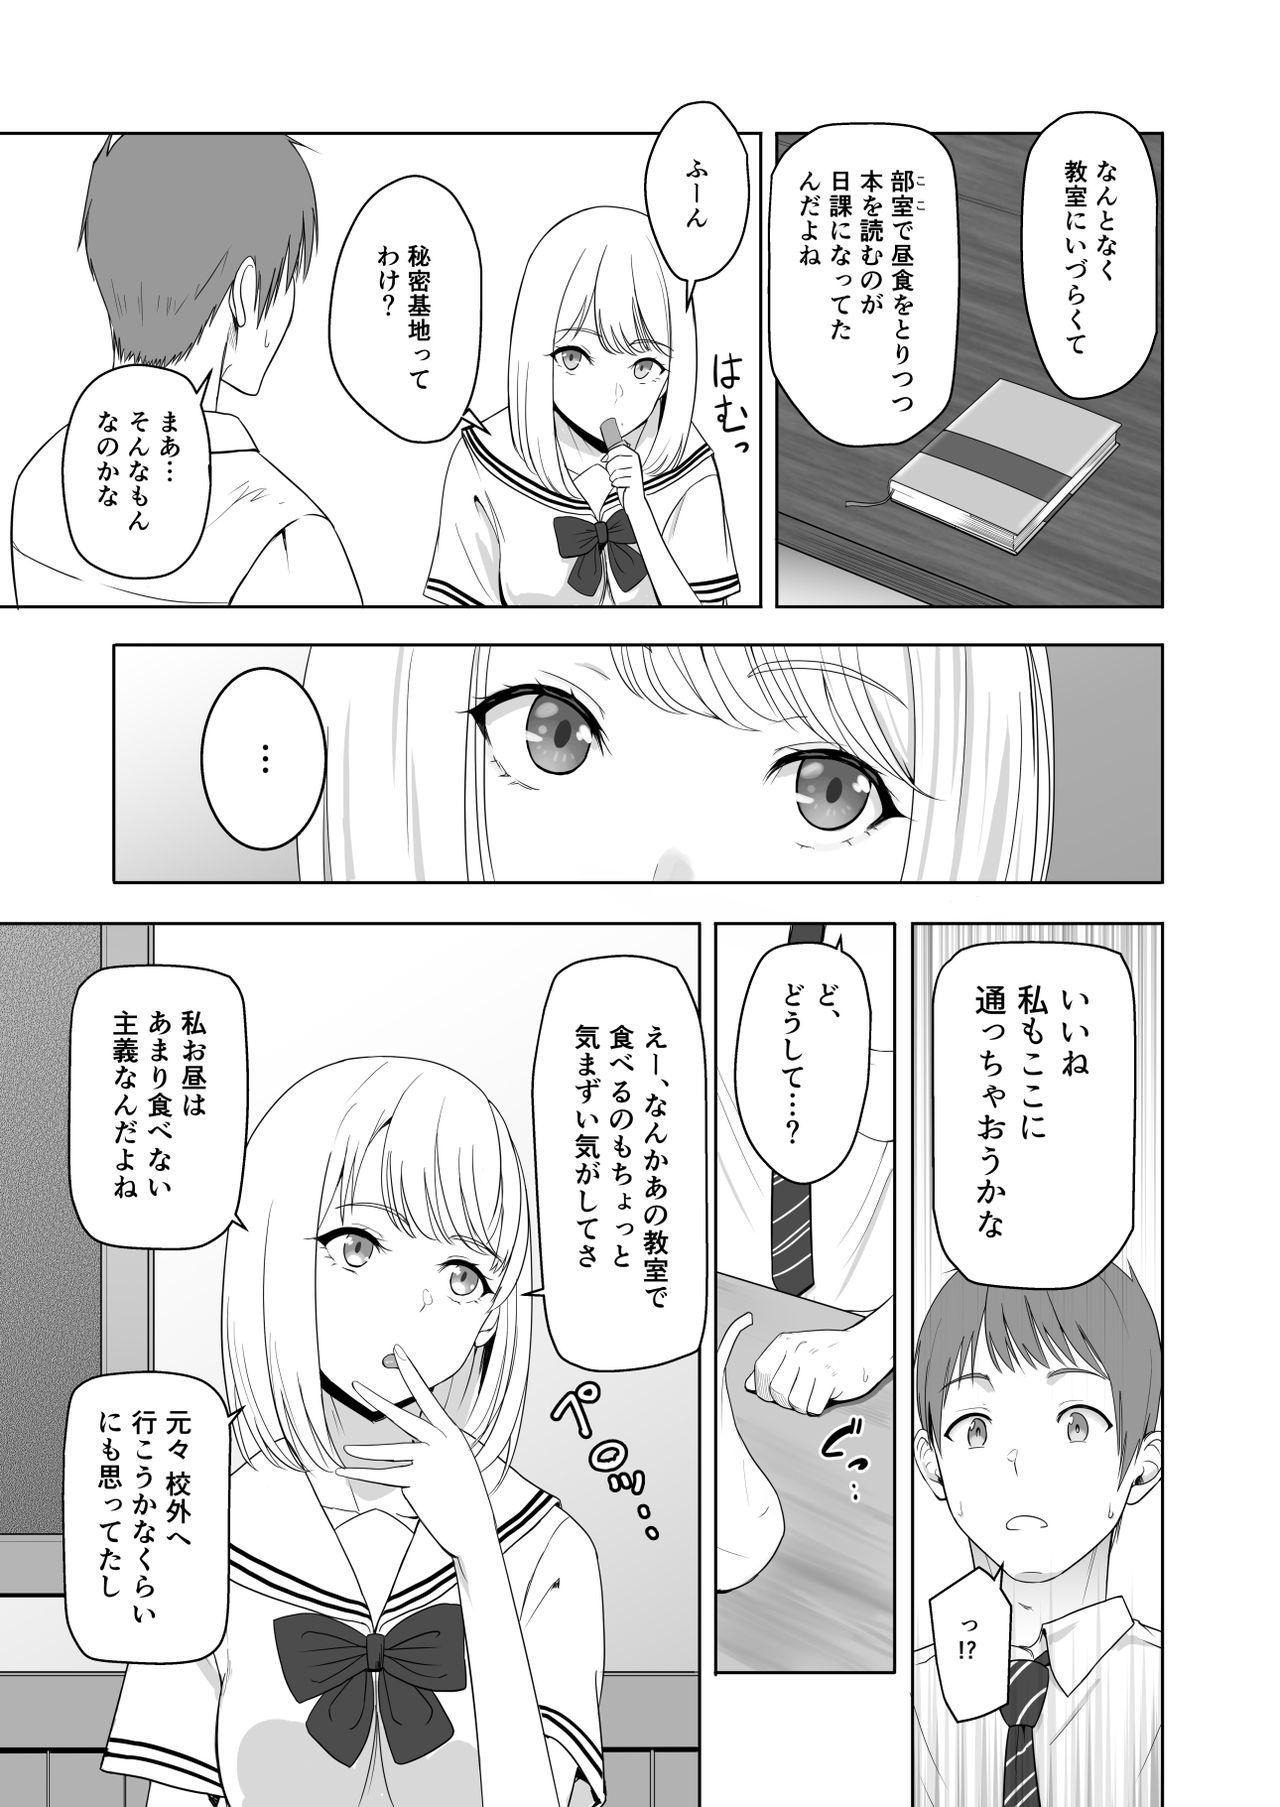 Kimi ga Tame. 2 Ichikawa Inori 21